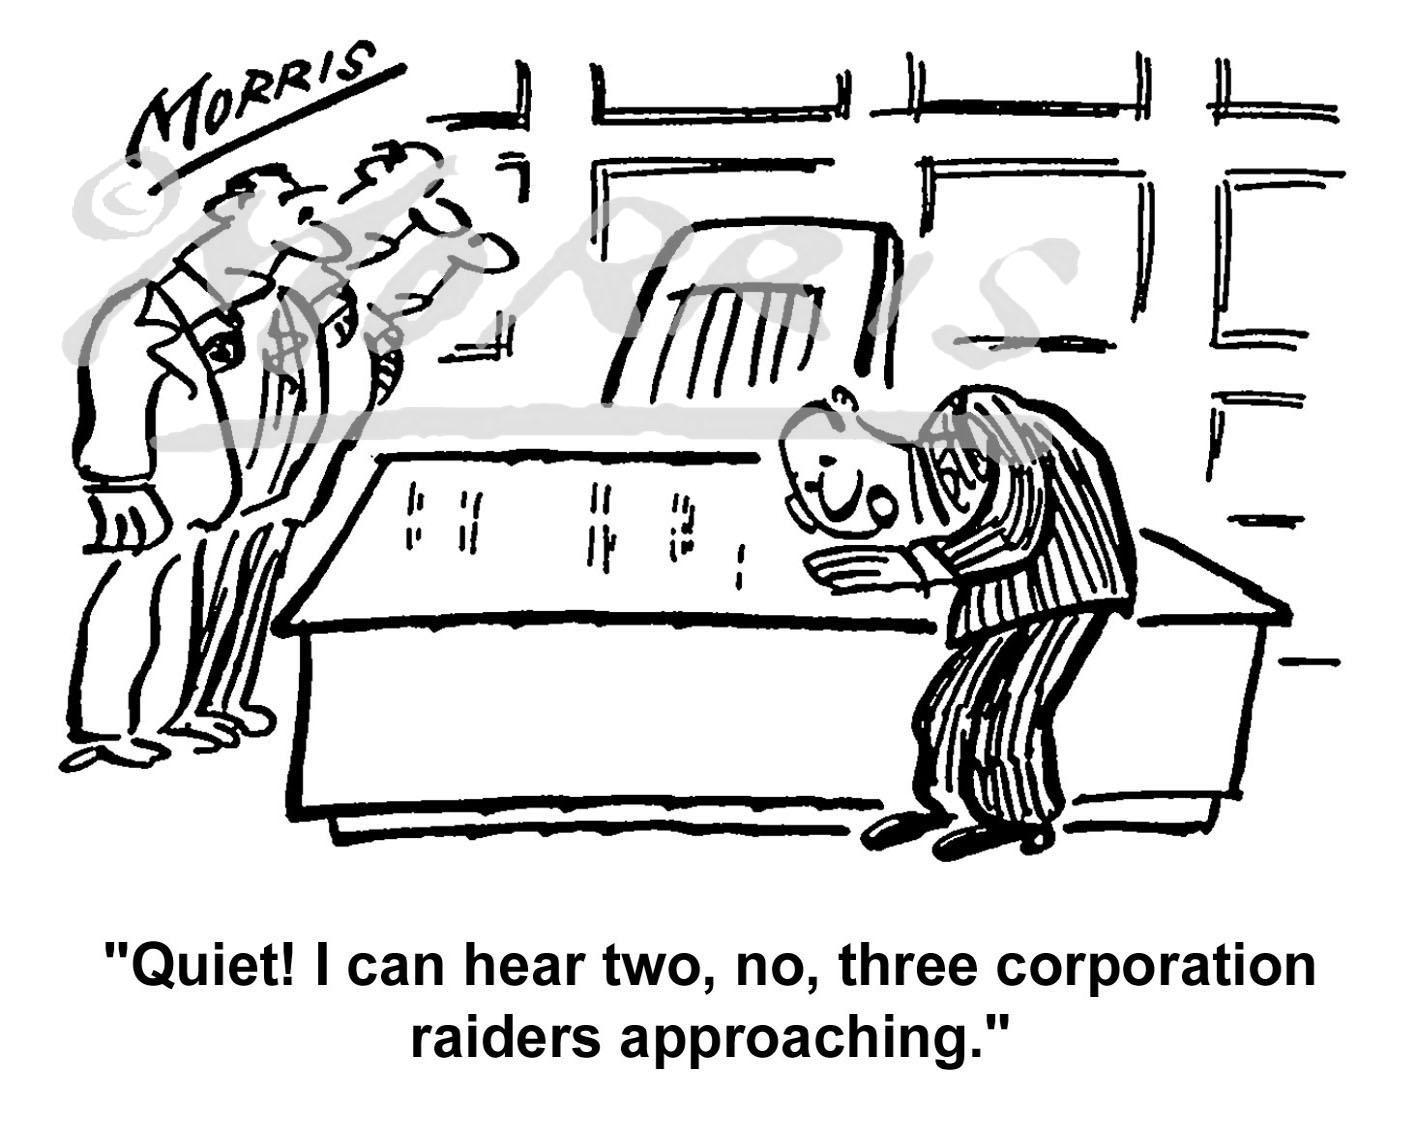 Boardroom corporation raiders cartoon Ref: 0733bw